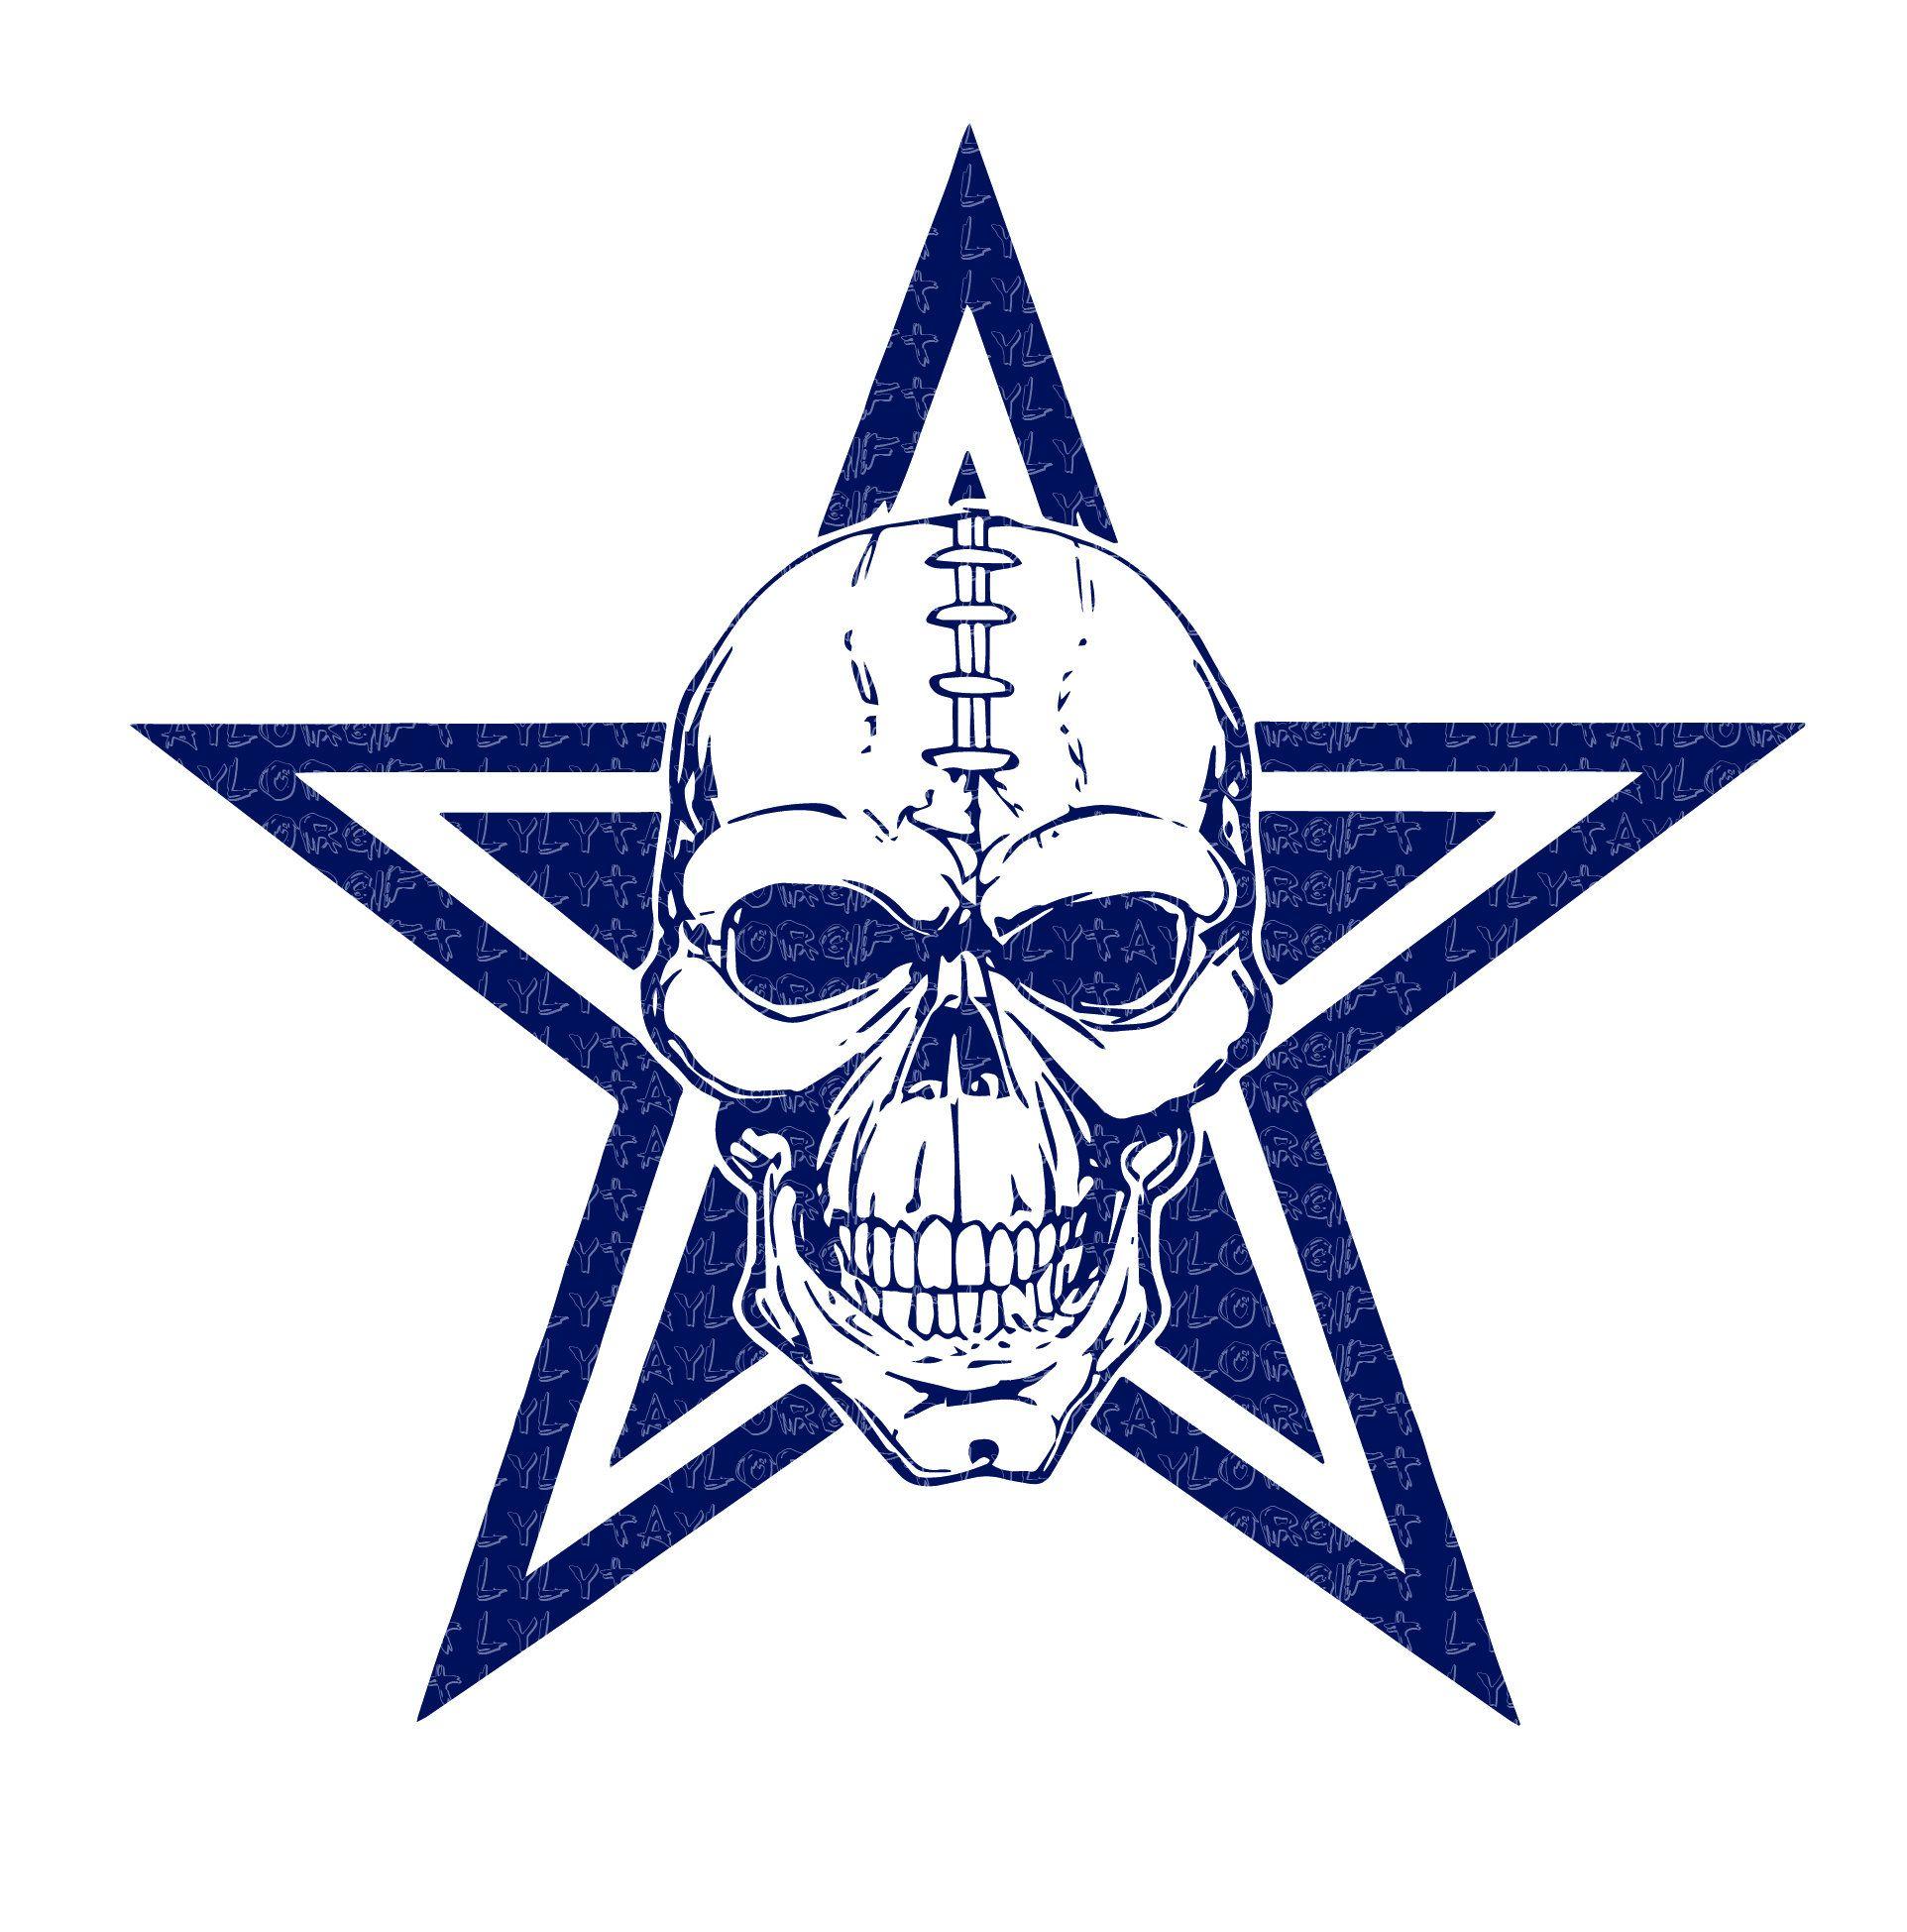 Dallas Cowboys svg,skull svg, nfc east division, champions